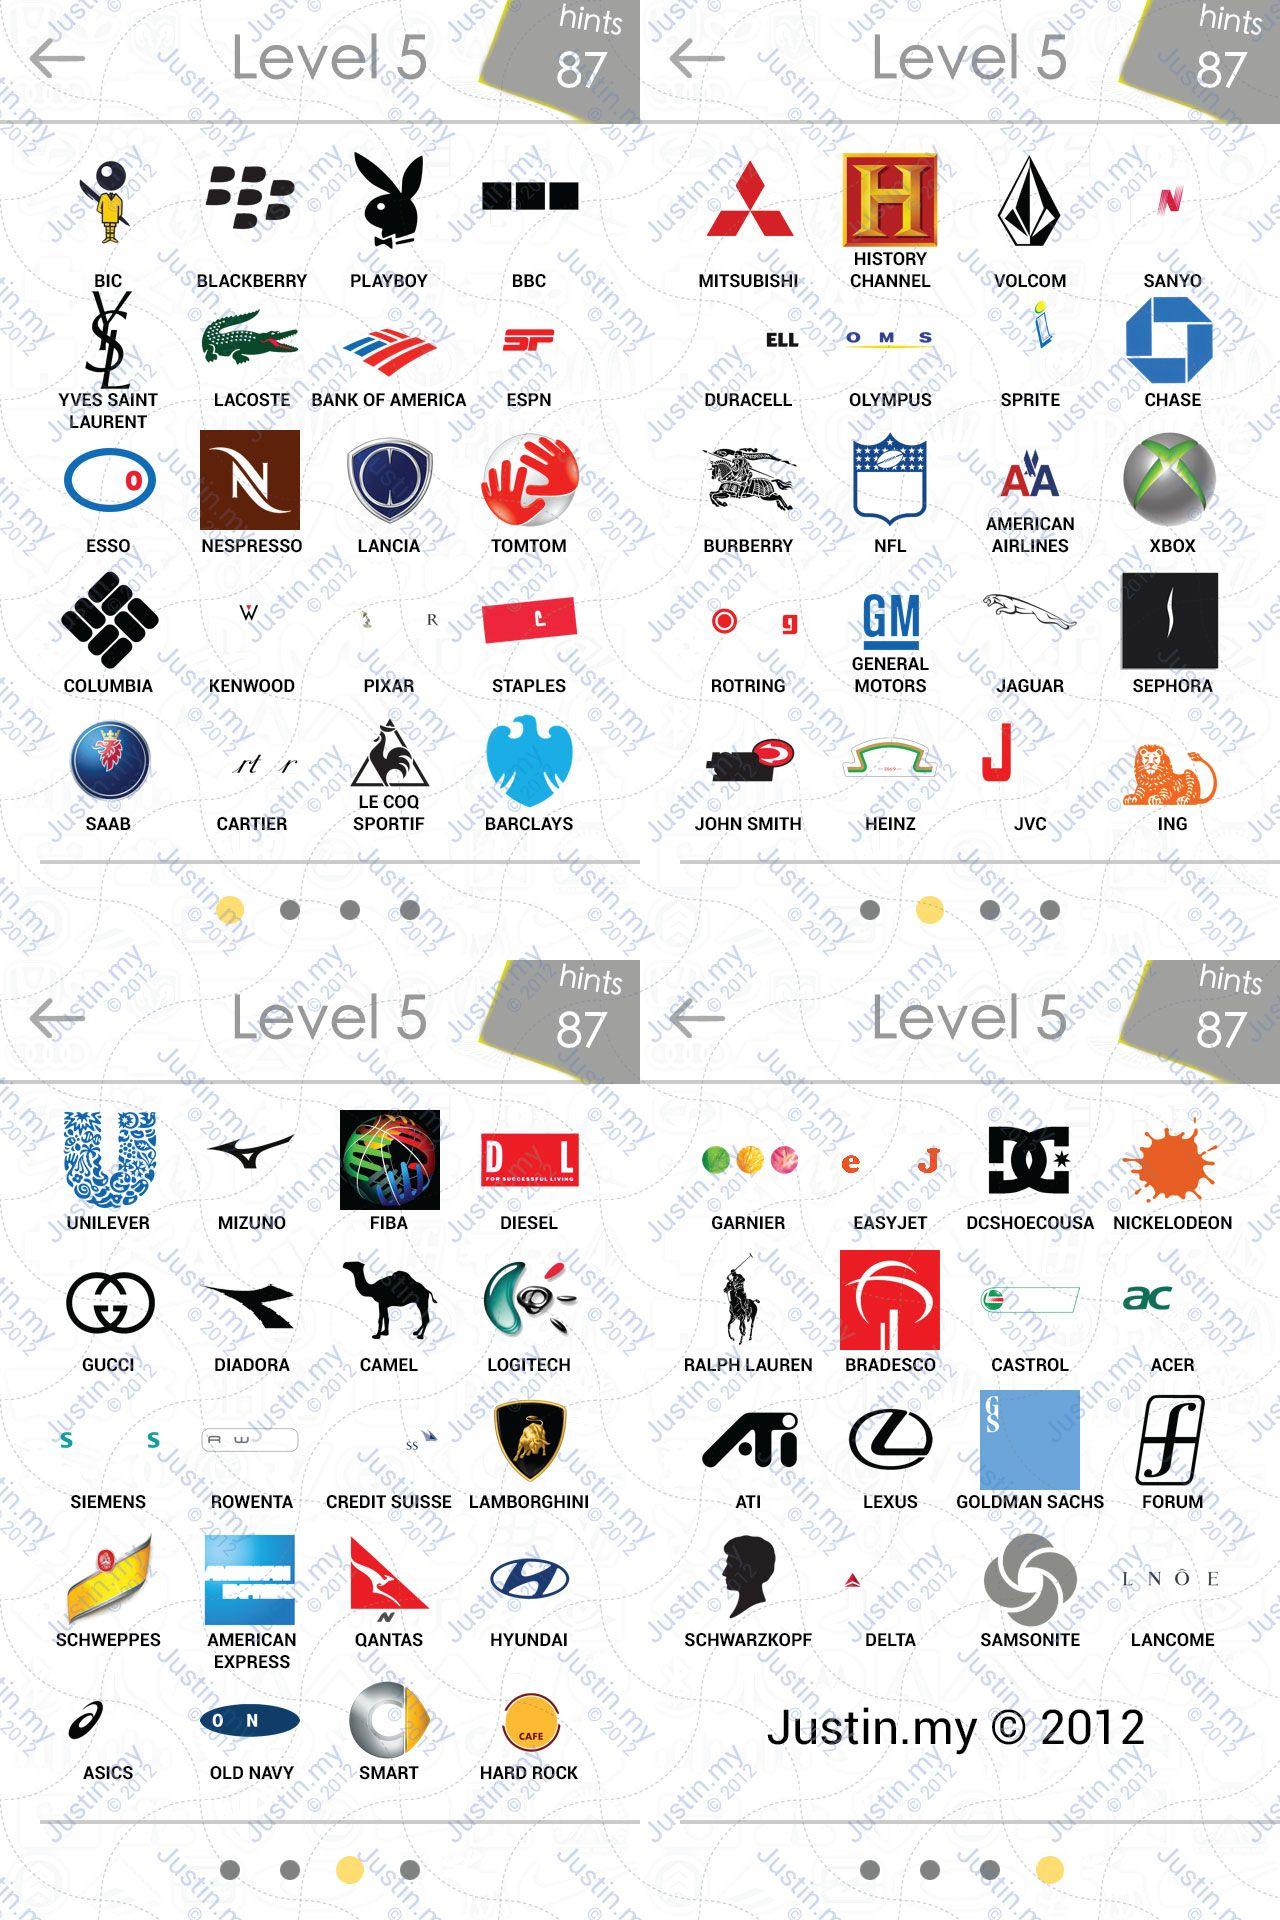 logos quiz answers page 5 justin my Logo quiz, Logo quiz